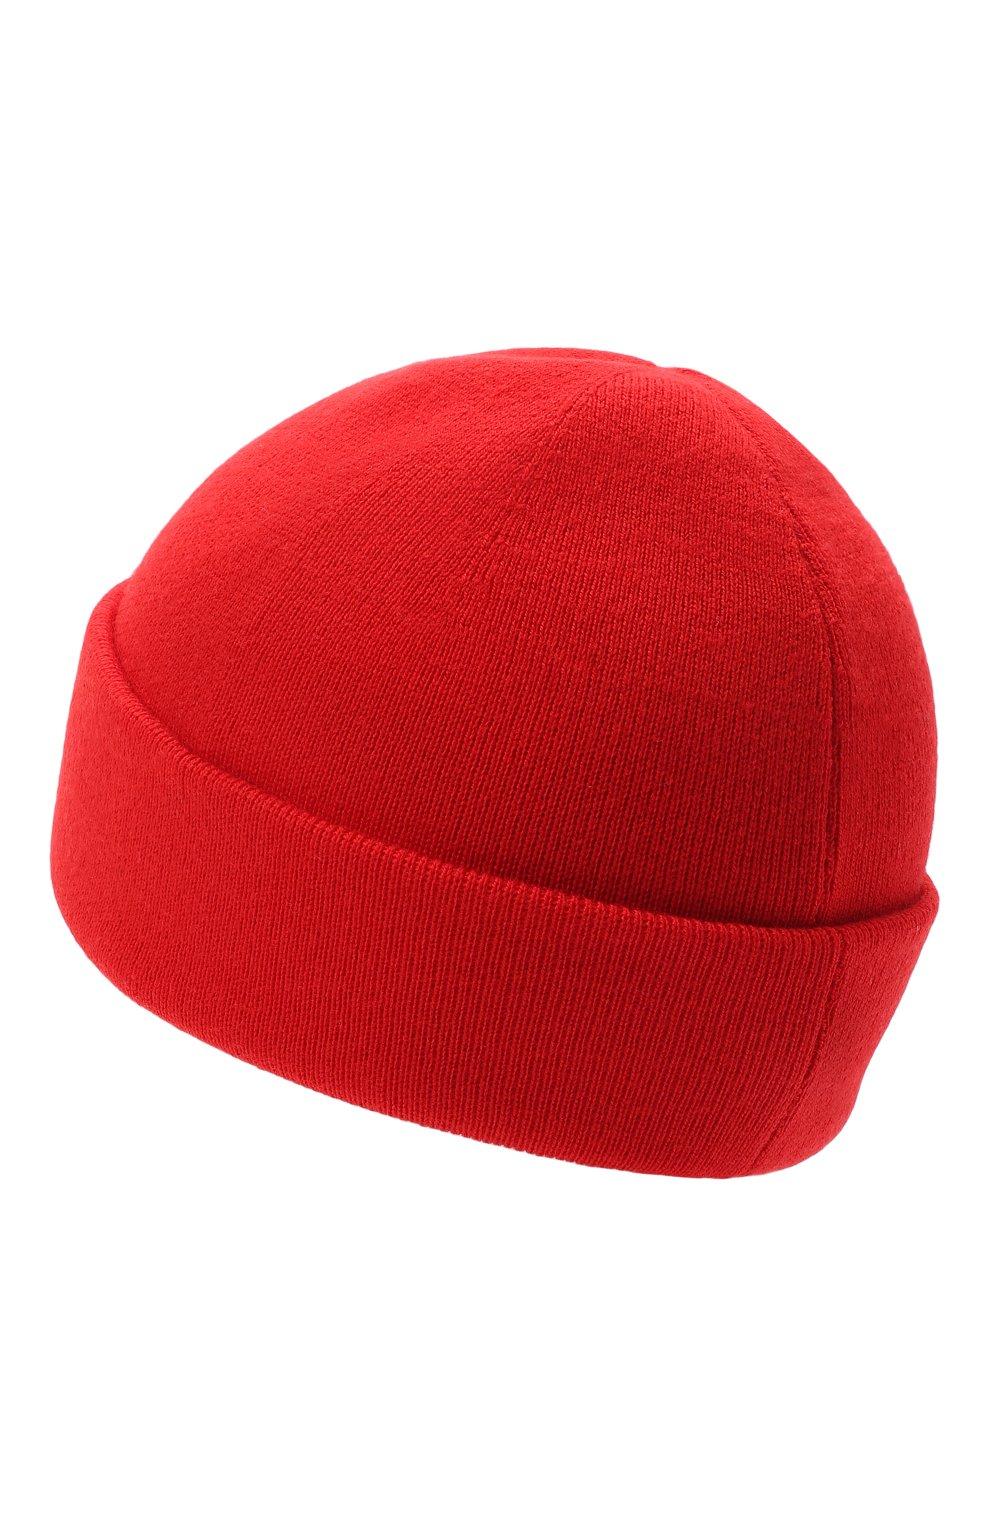 Мужская шерстяная шапка GUCCI красного цвета, арт. 612118/4G332 | Фото 2